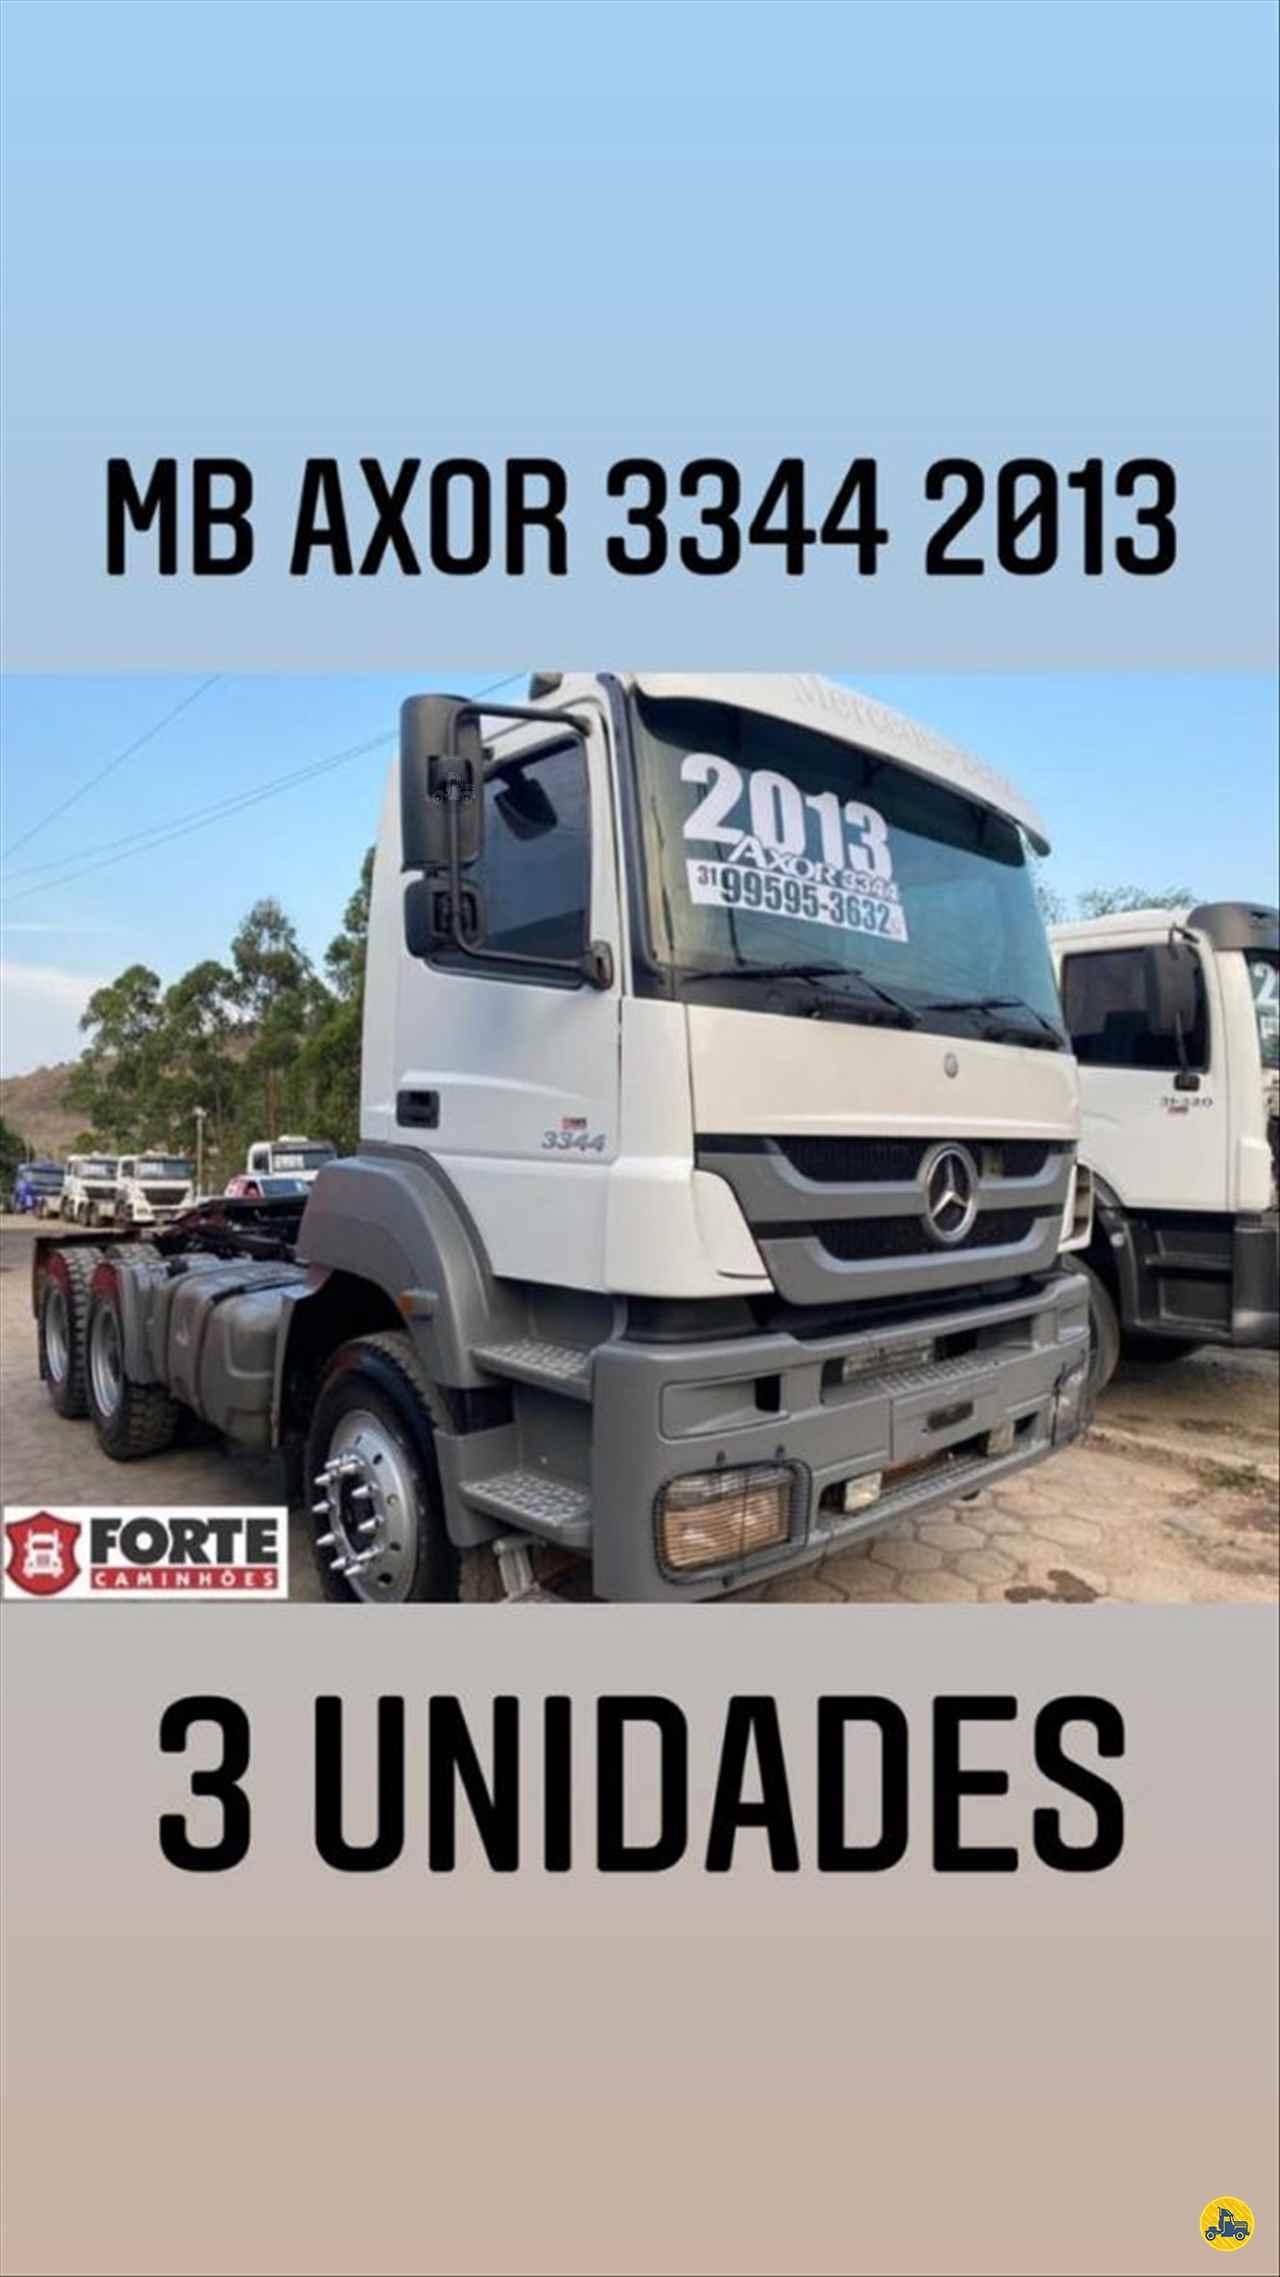 MERCEDES-BENZ MB 3344 221000km 2013/2013 Forte Caminhões MG